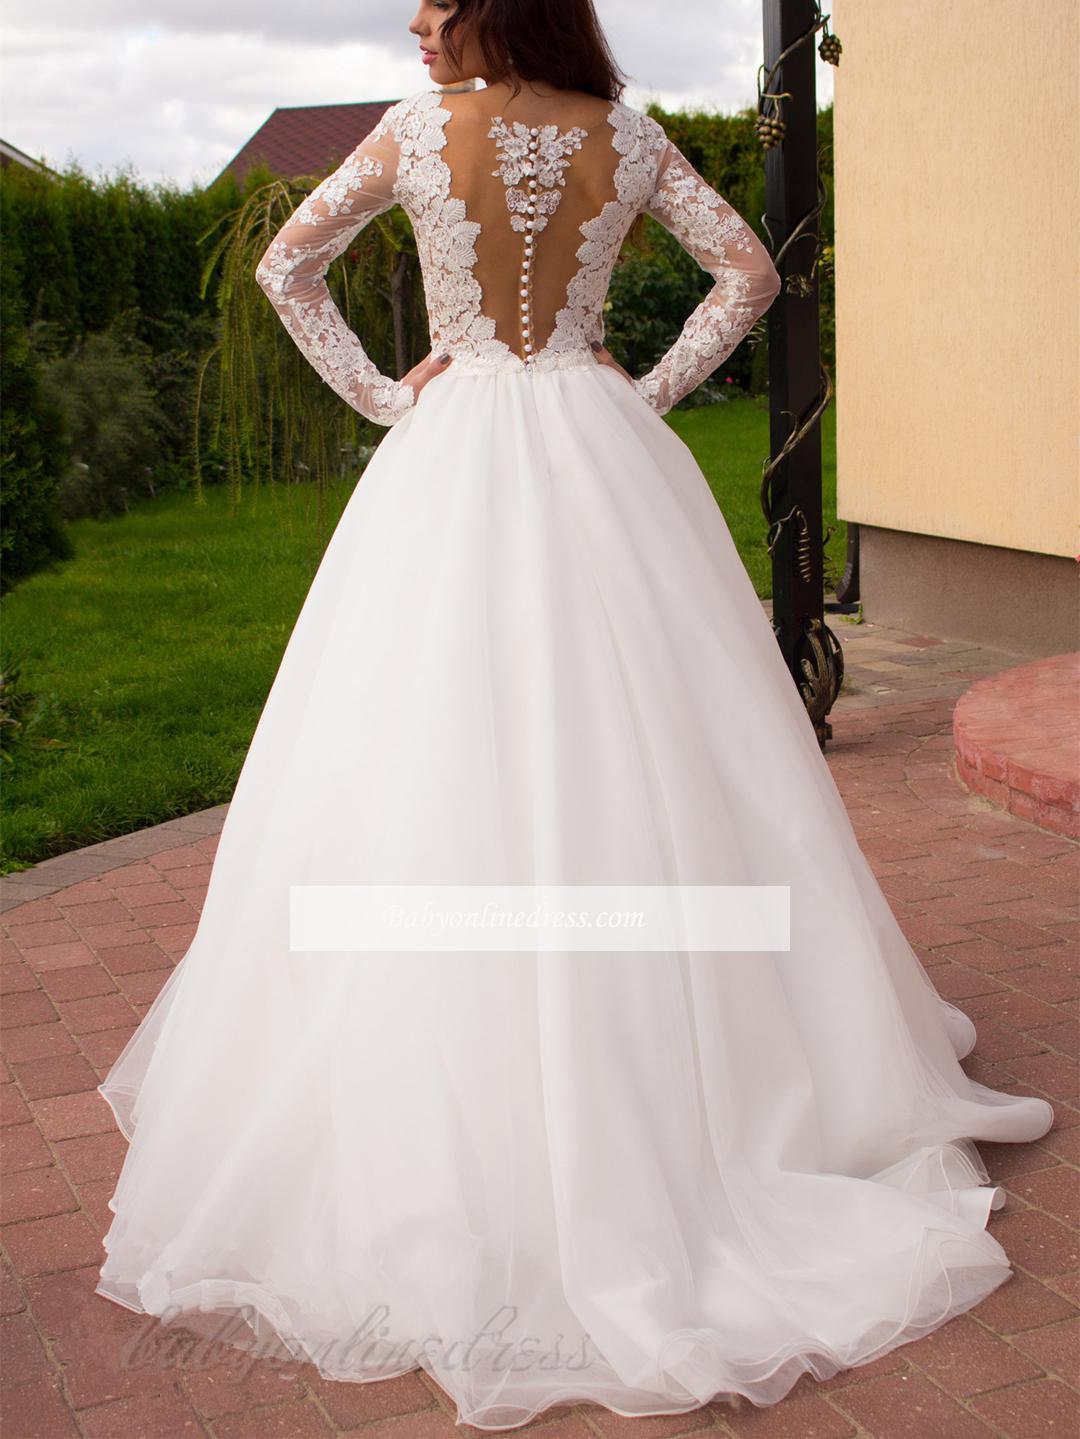 Elegant Long Sleeves White Lace Appliques Wedding Dress ...